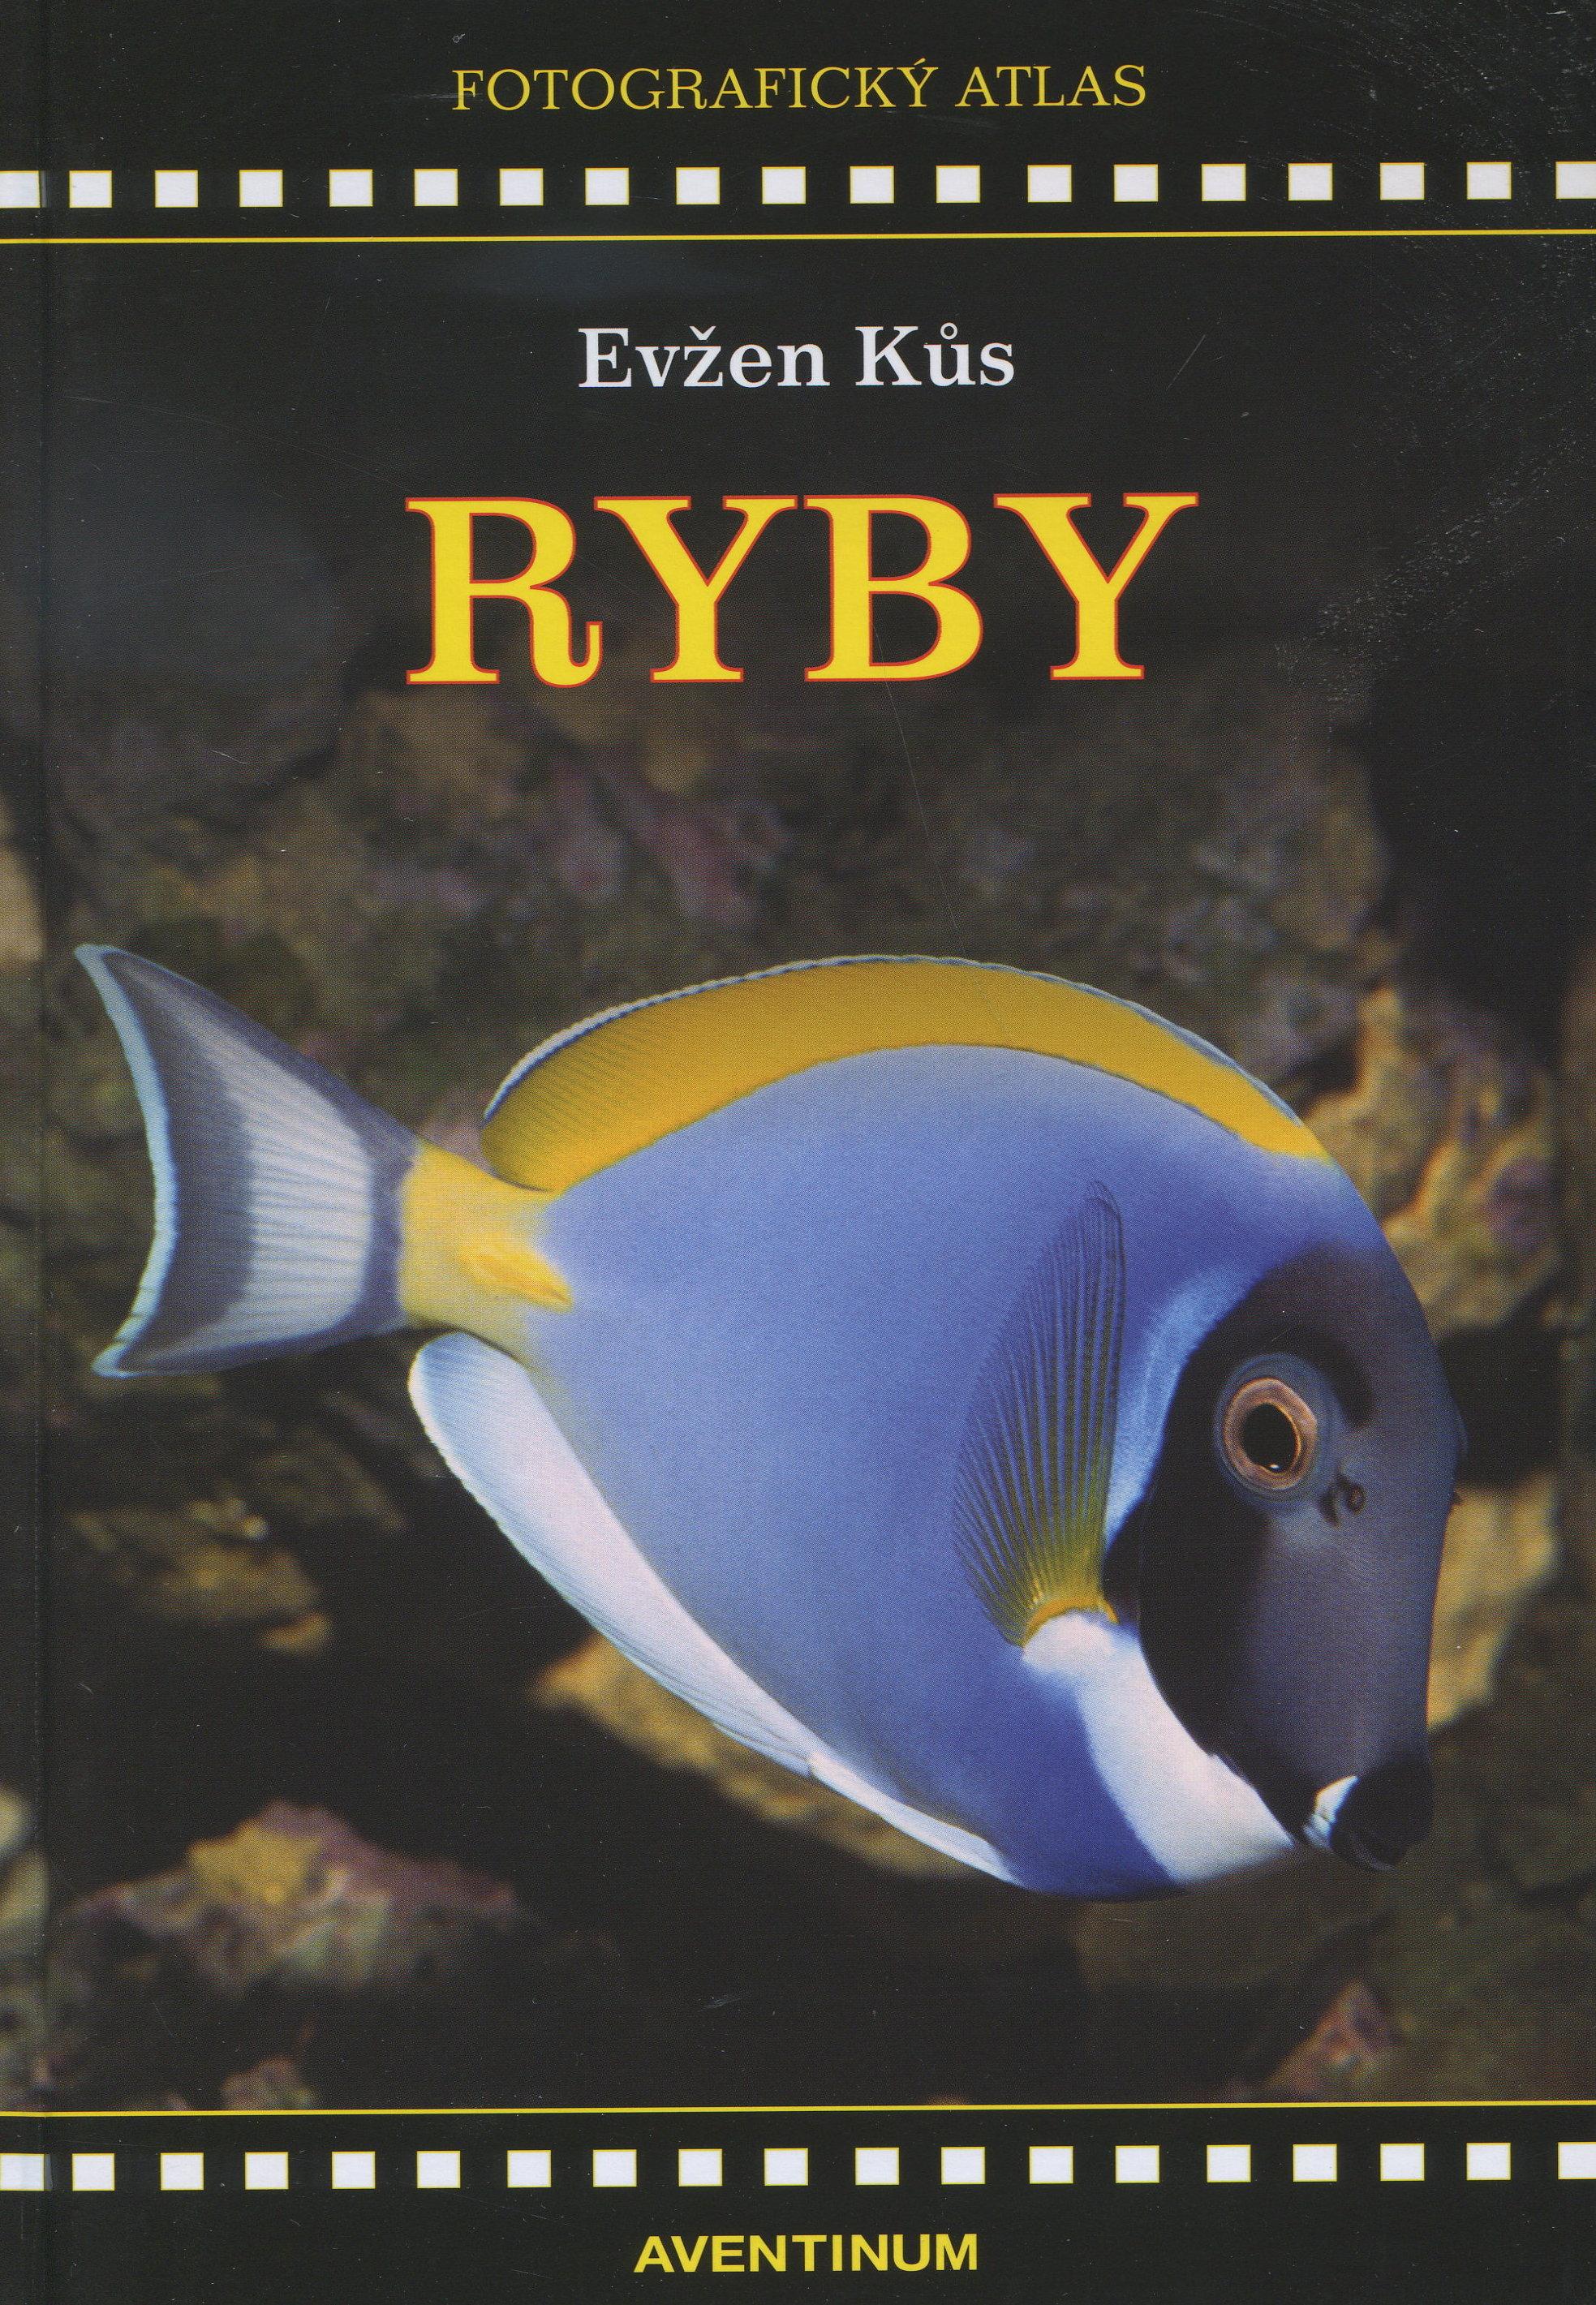 Ryby - Fotografický atlas